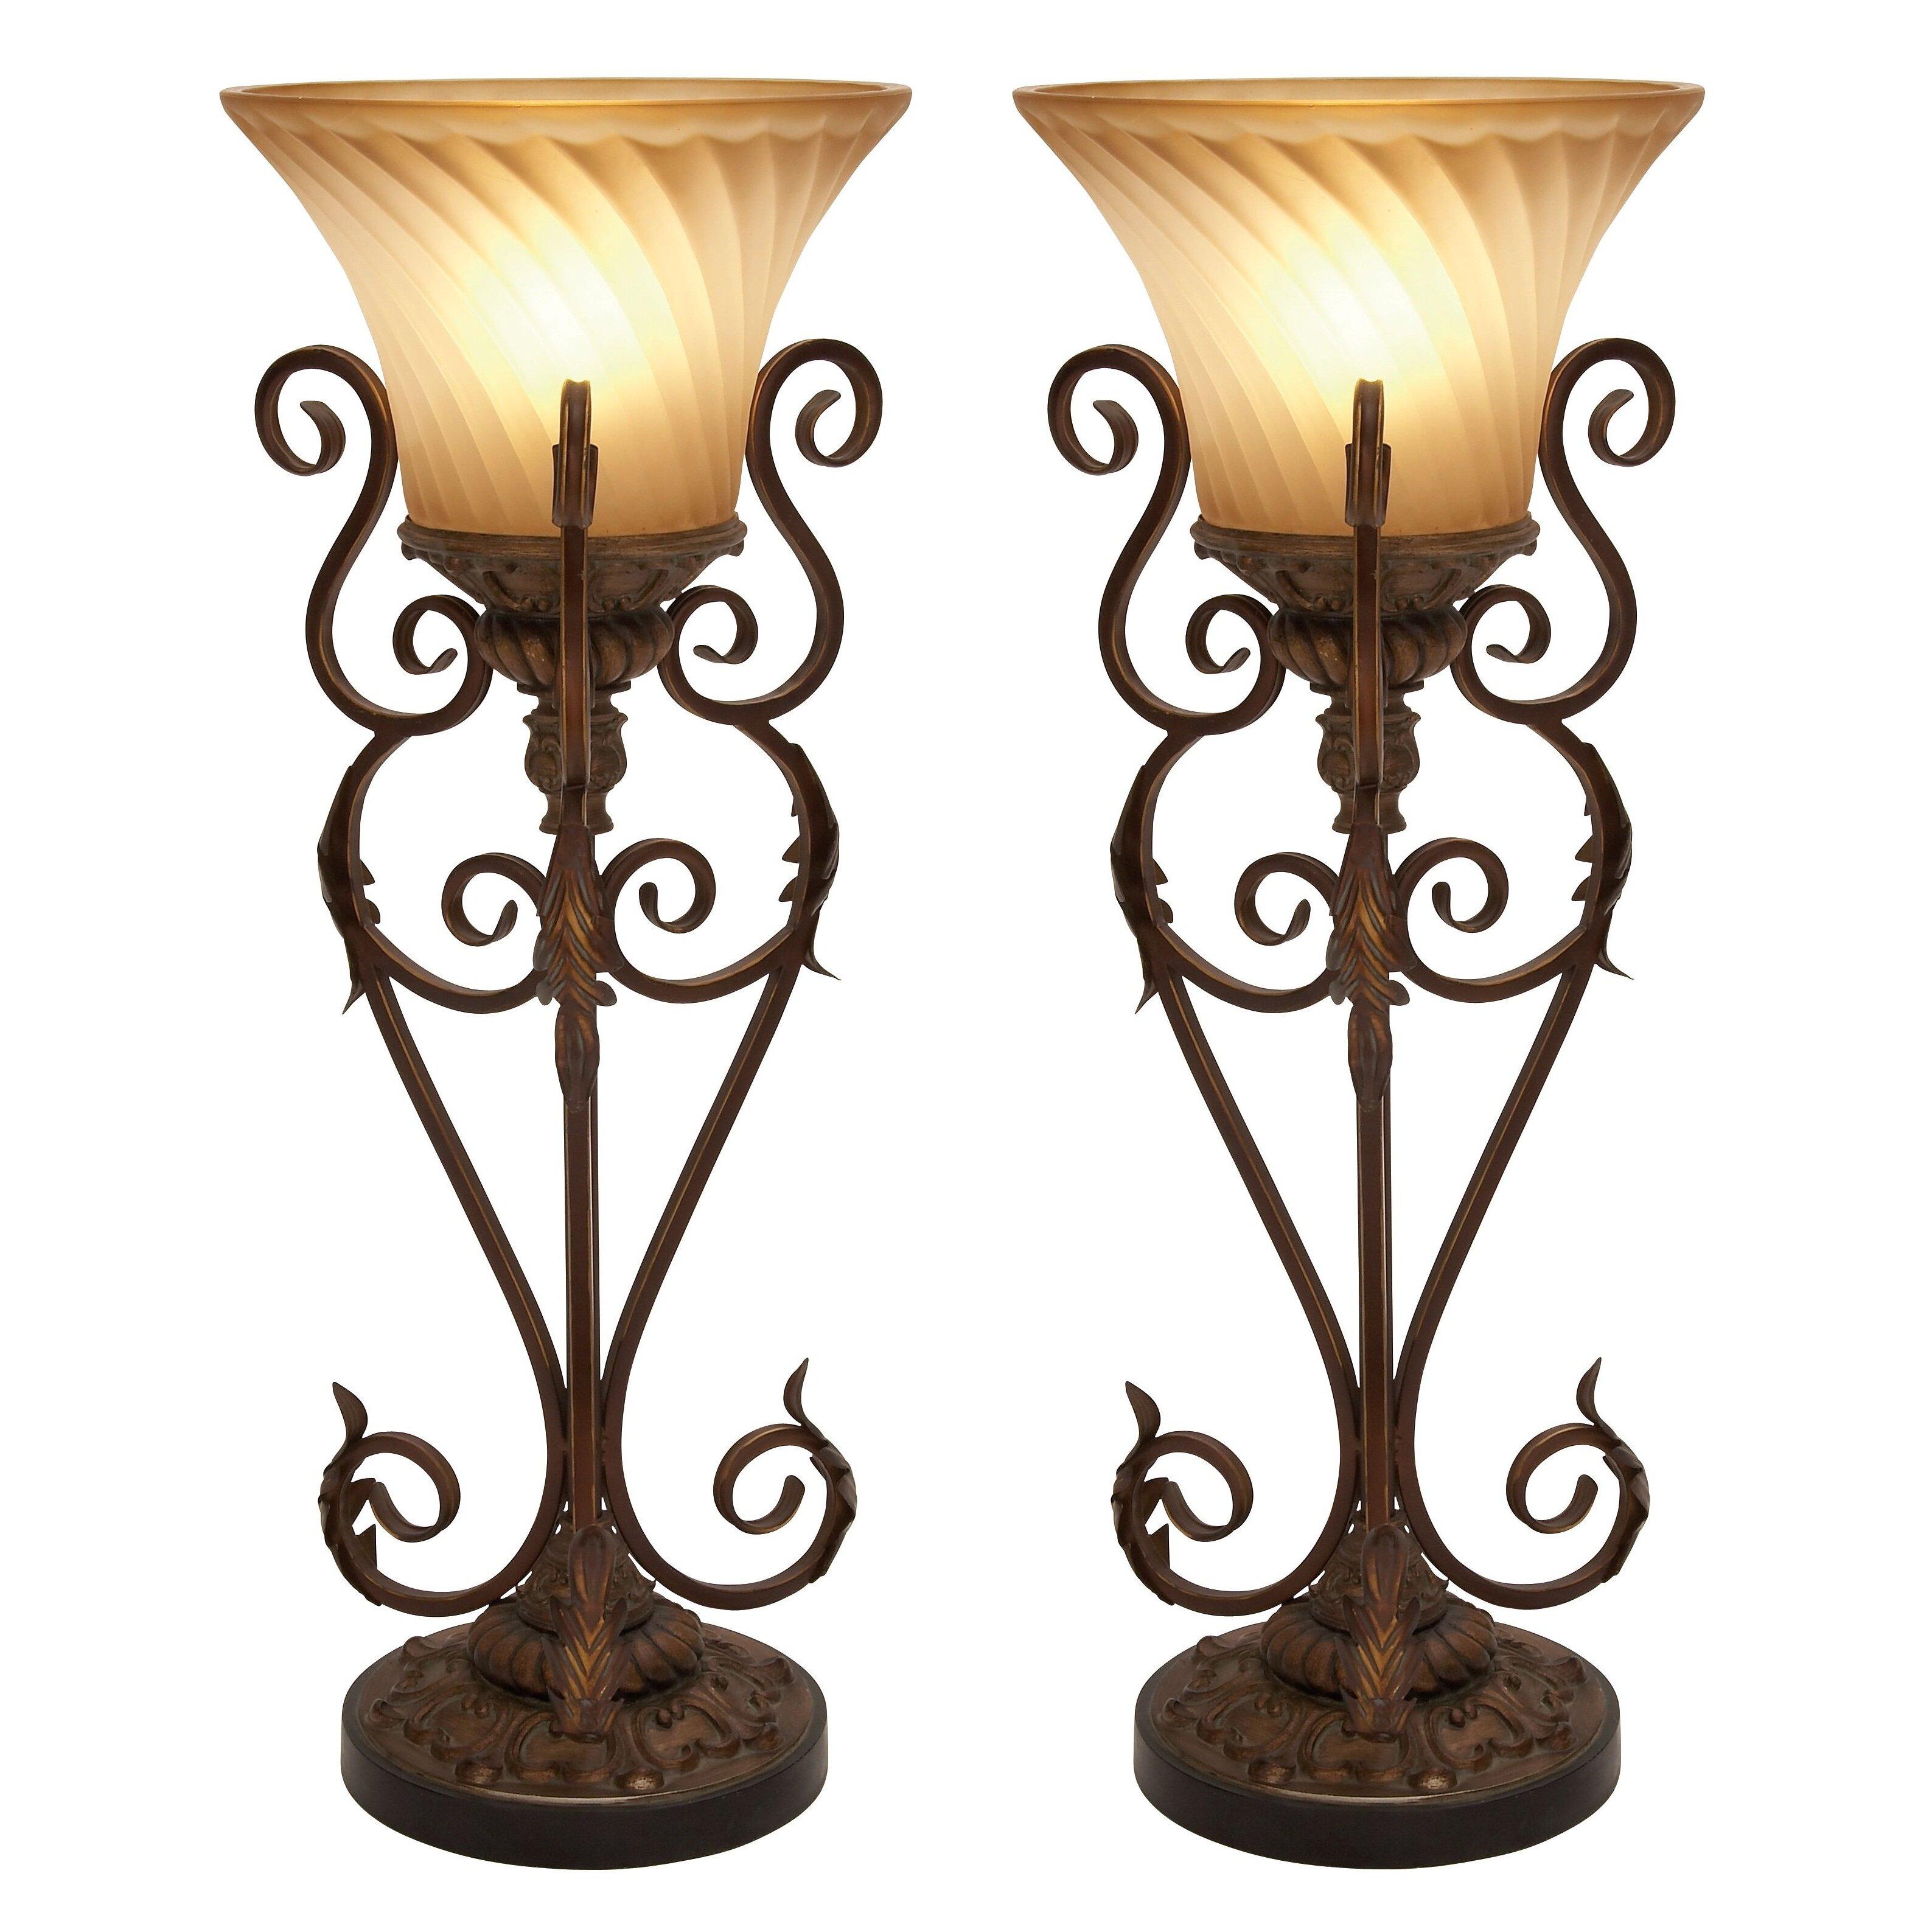 aspire lisette torchiere 30 table lamp set of 2. Black Bedroom Furniture Sets. Home Design Ideas